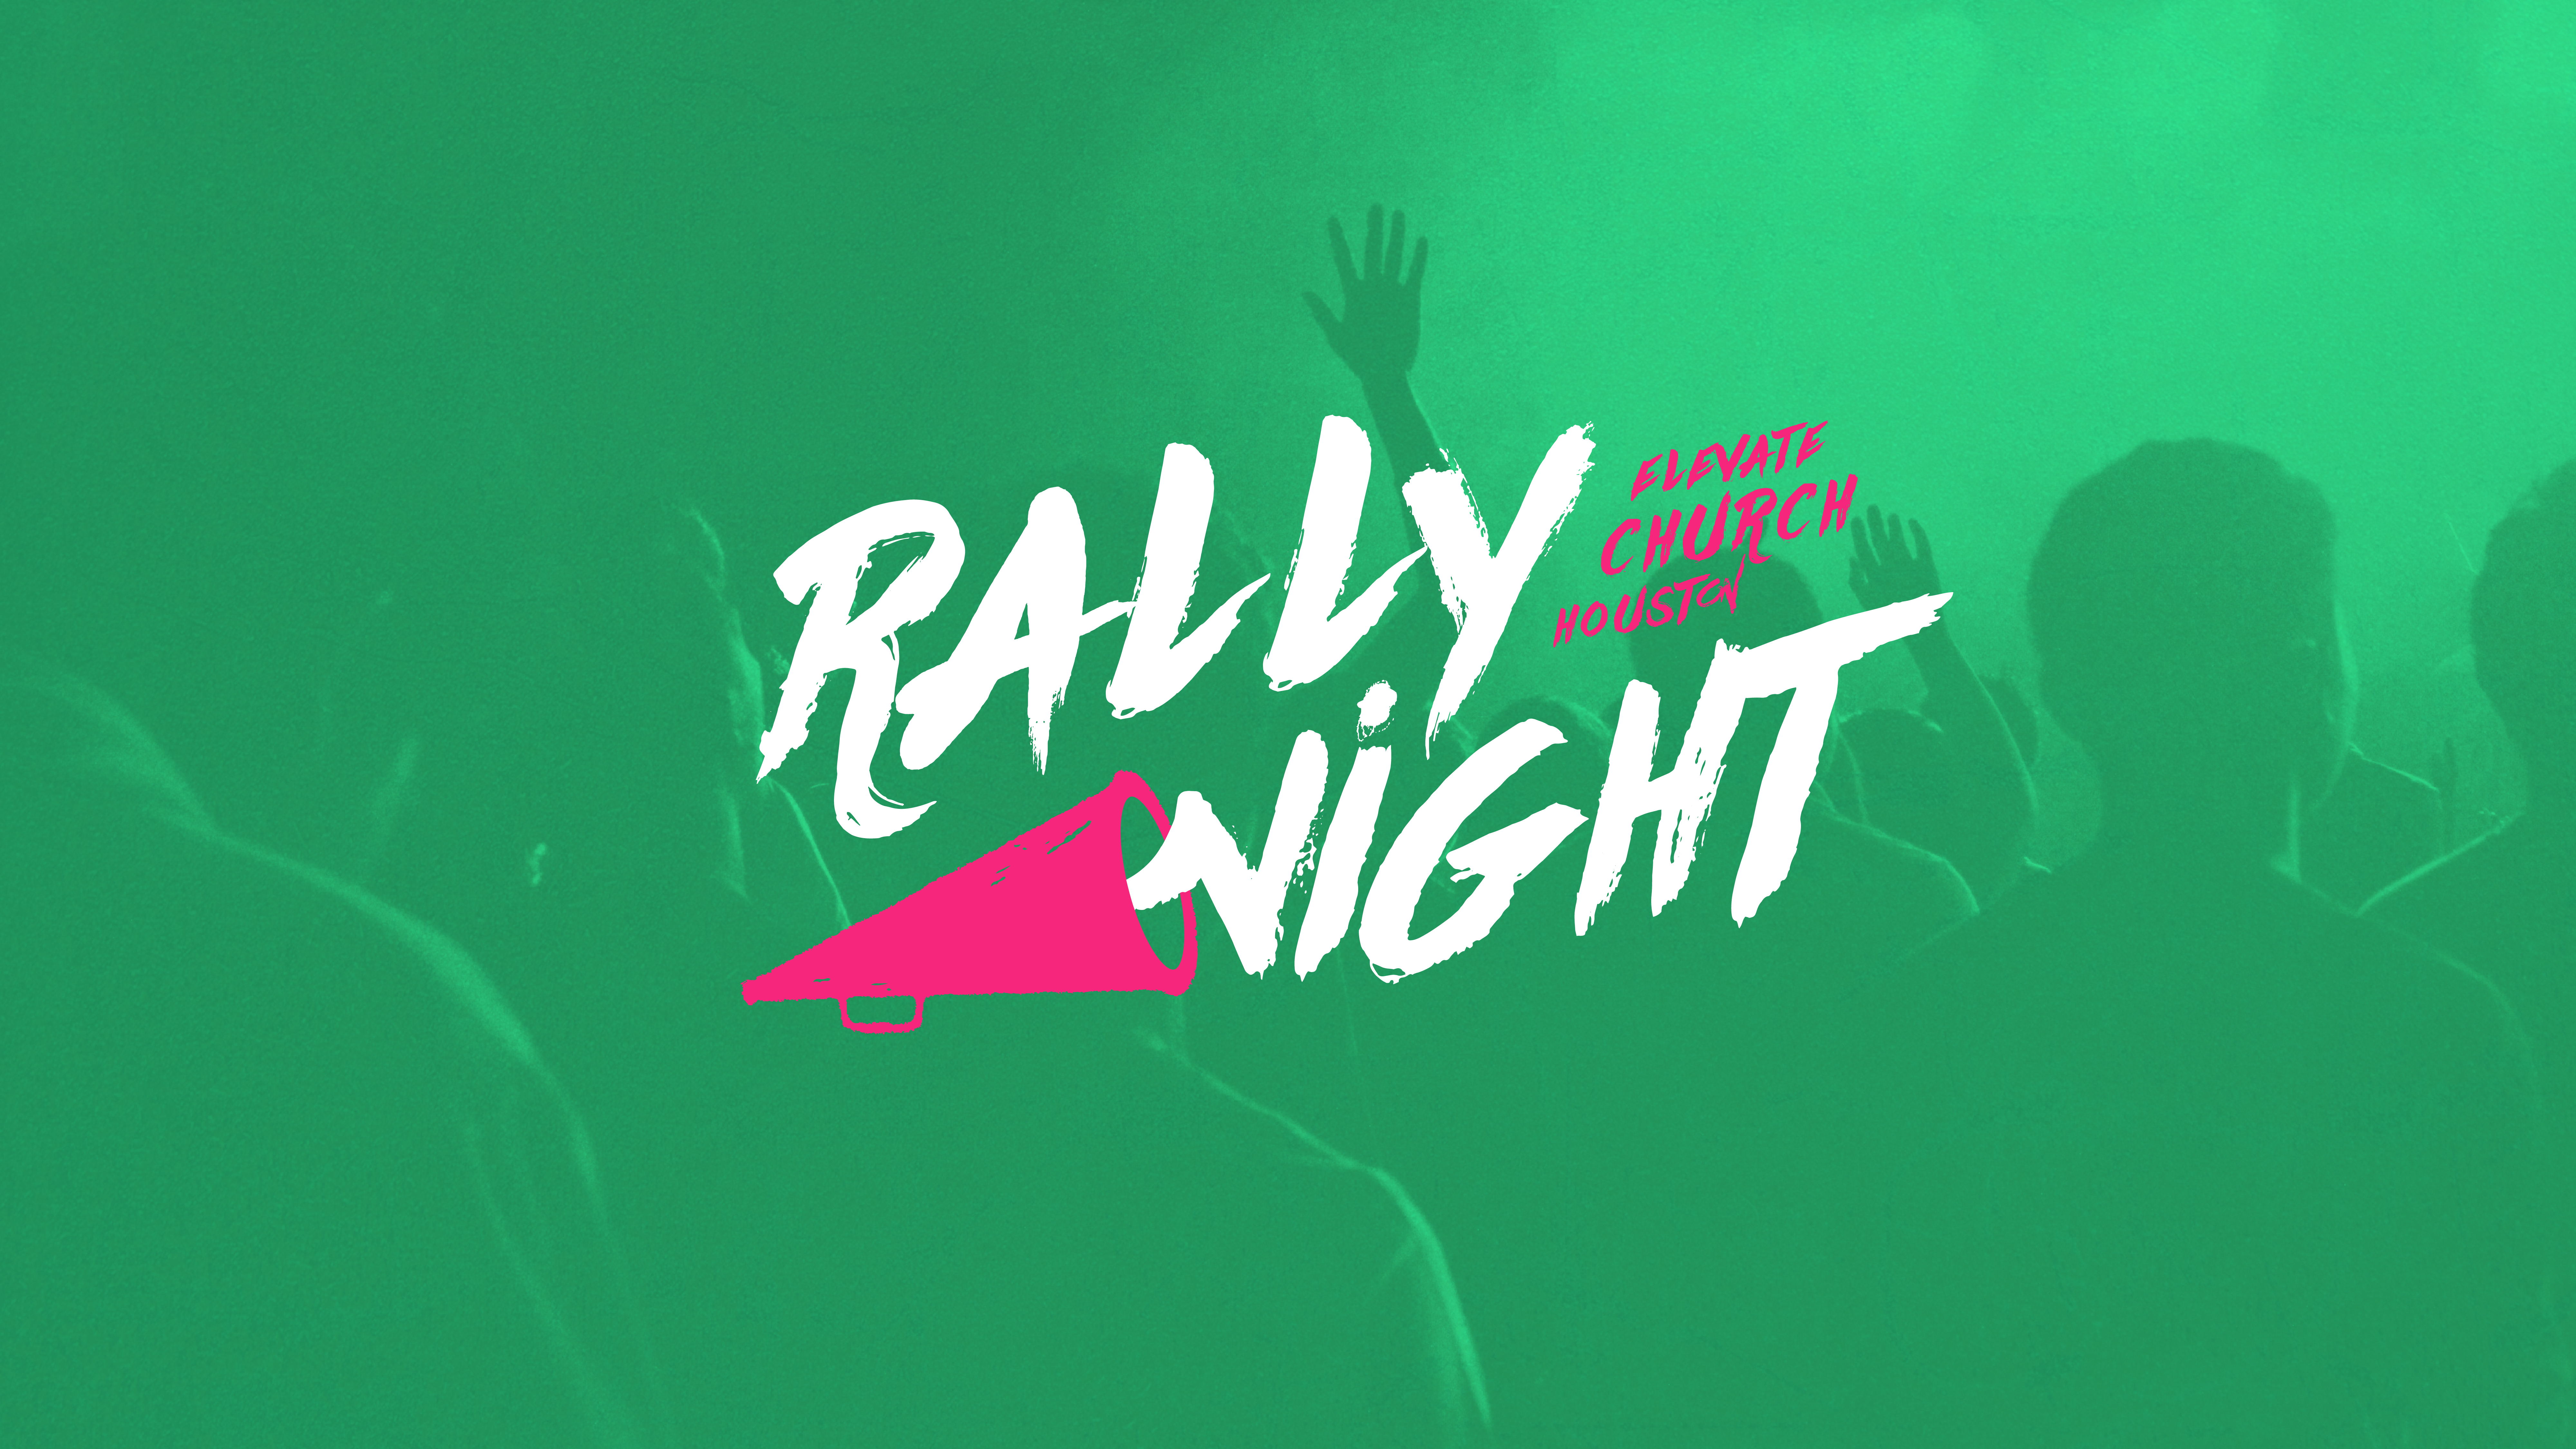 Ec rally night ss current2